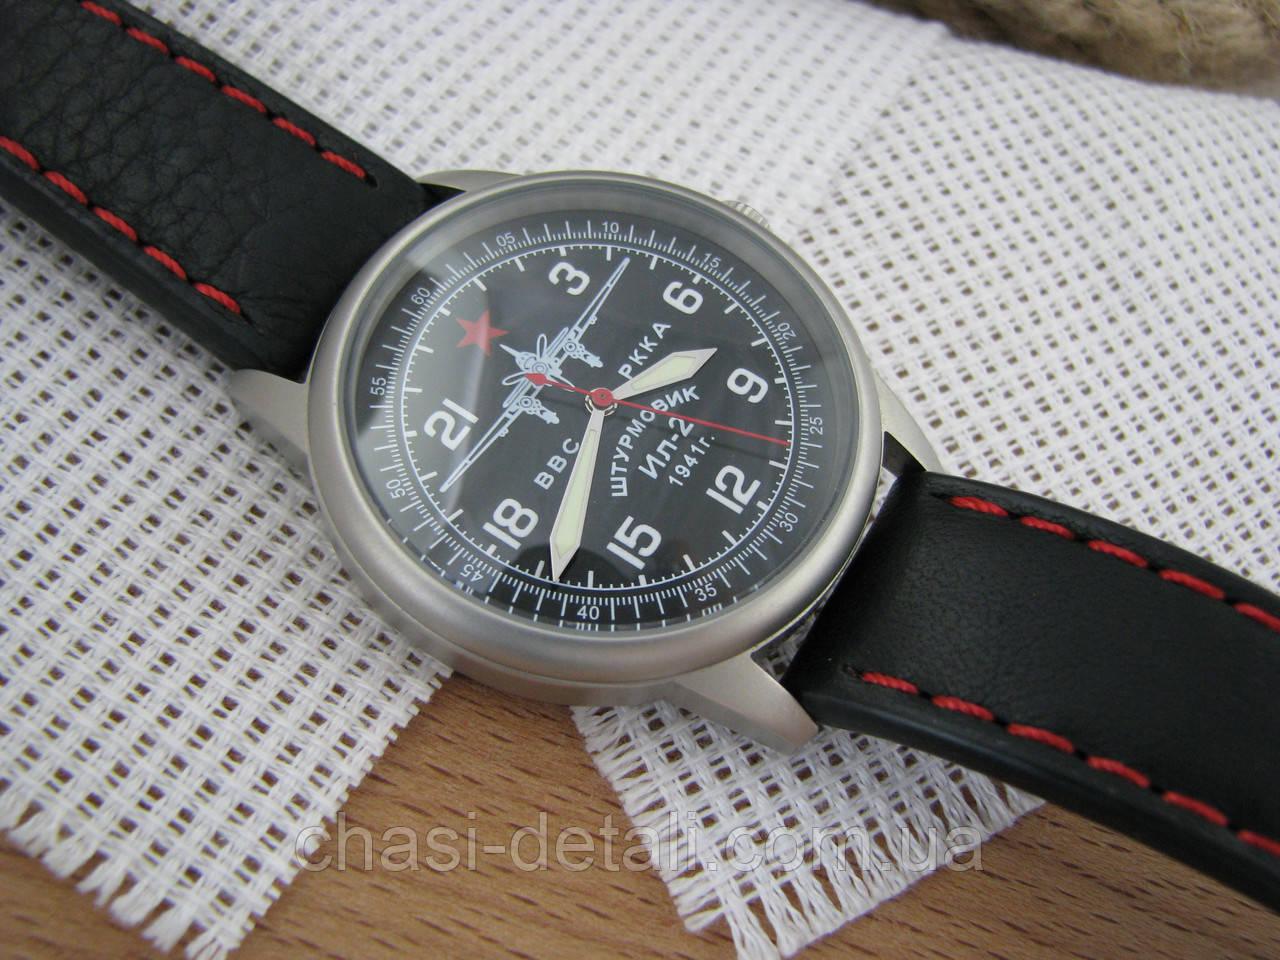 Часы Ракета 24 часа. наручные часы. Механизм советский